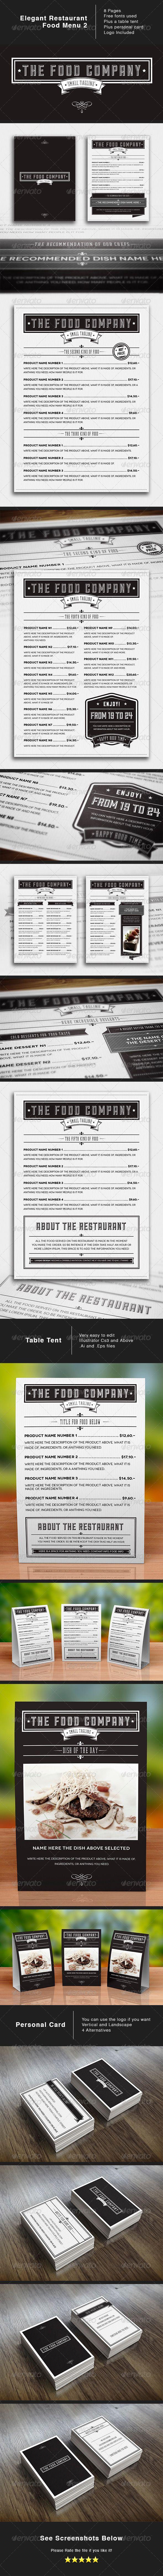 lunch menu inspiration